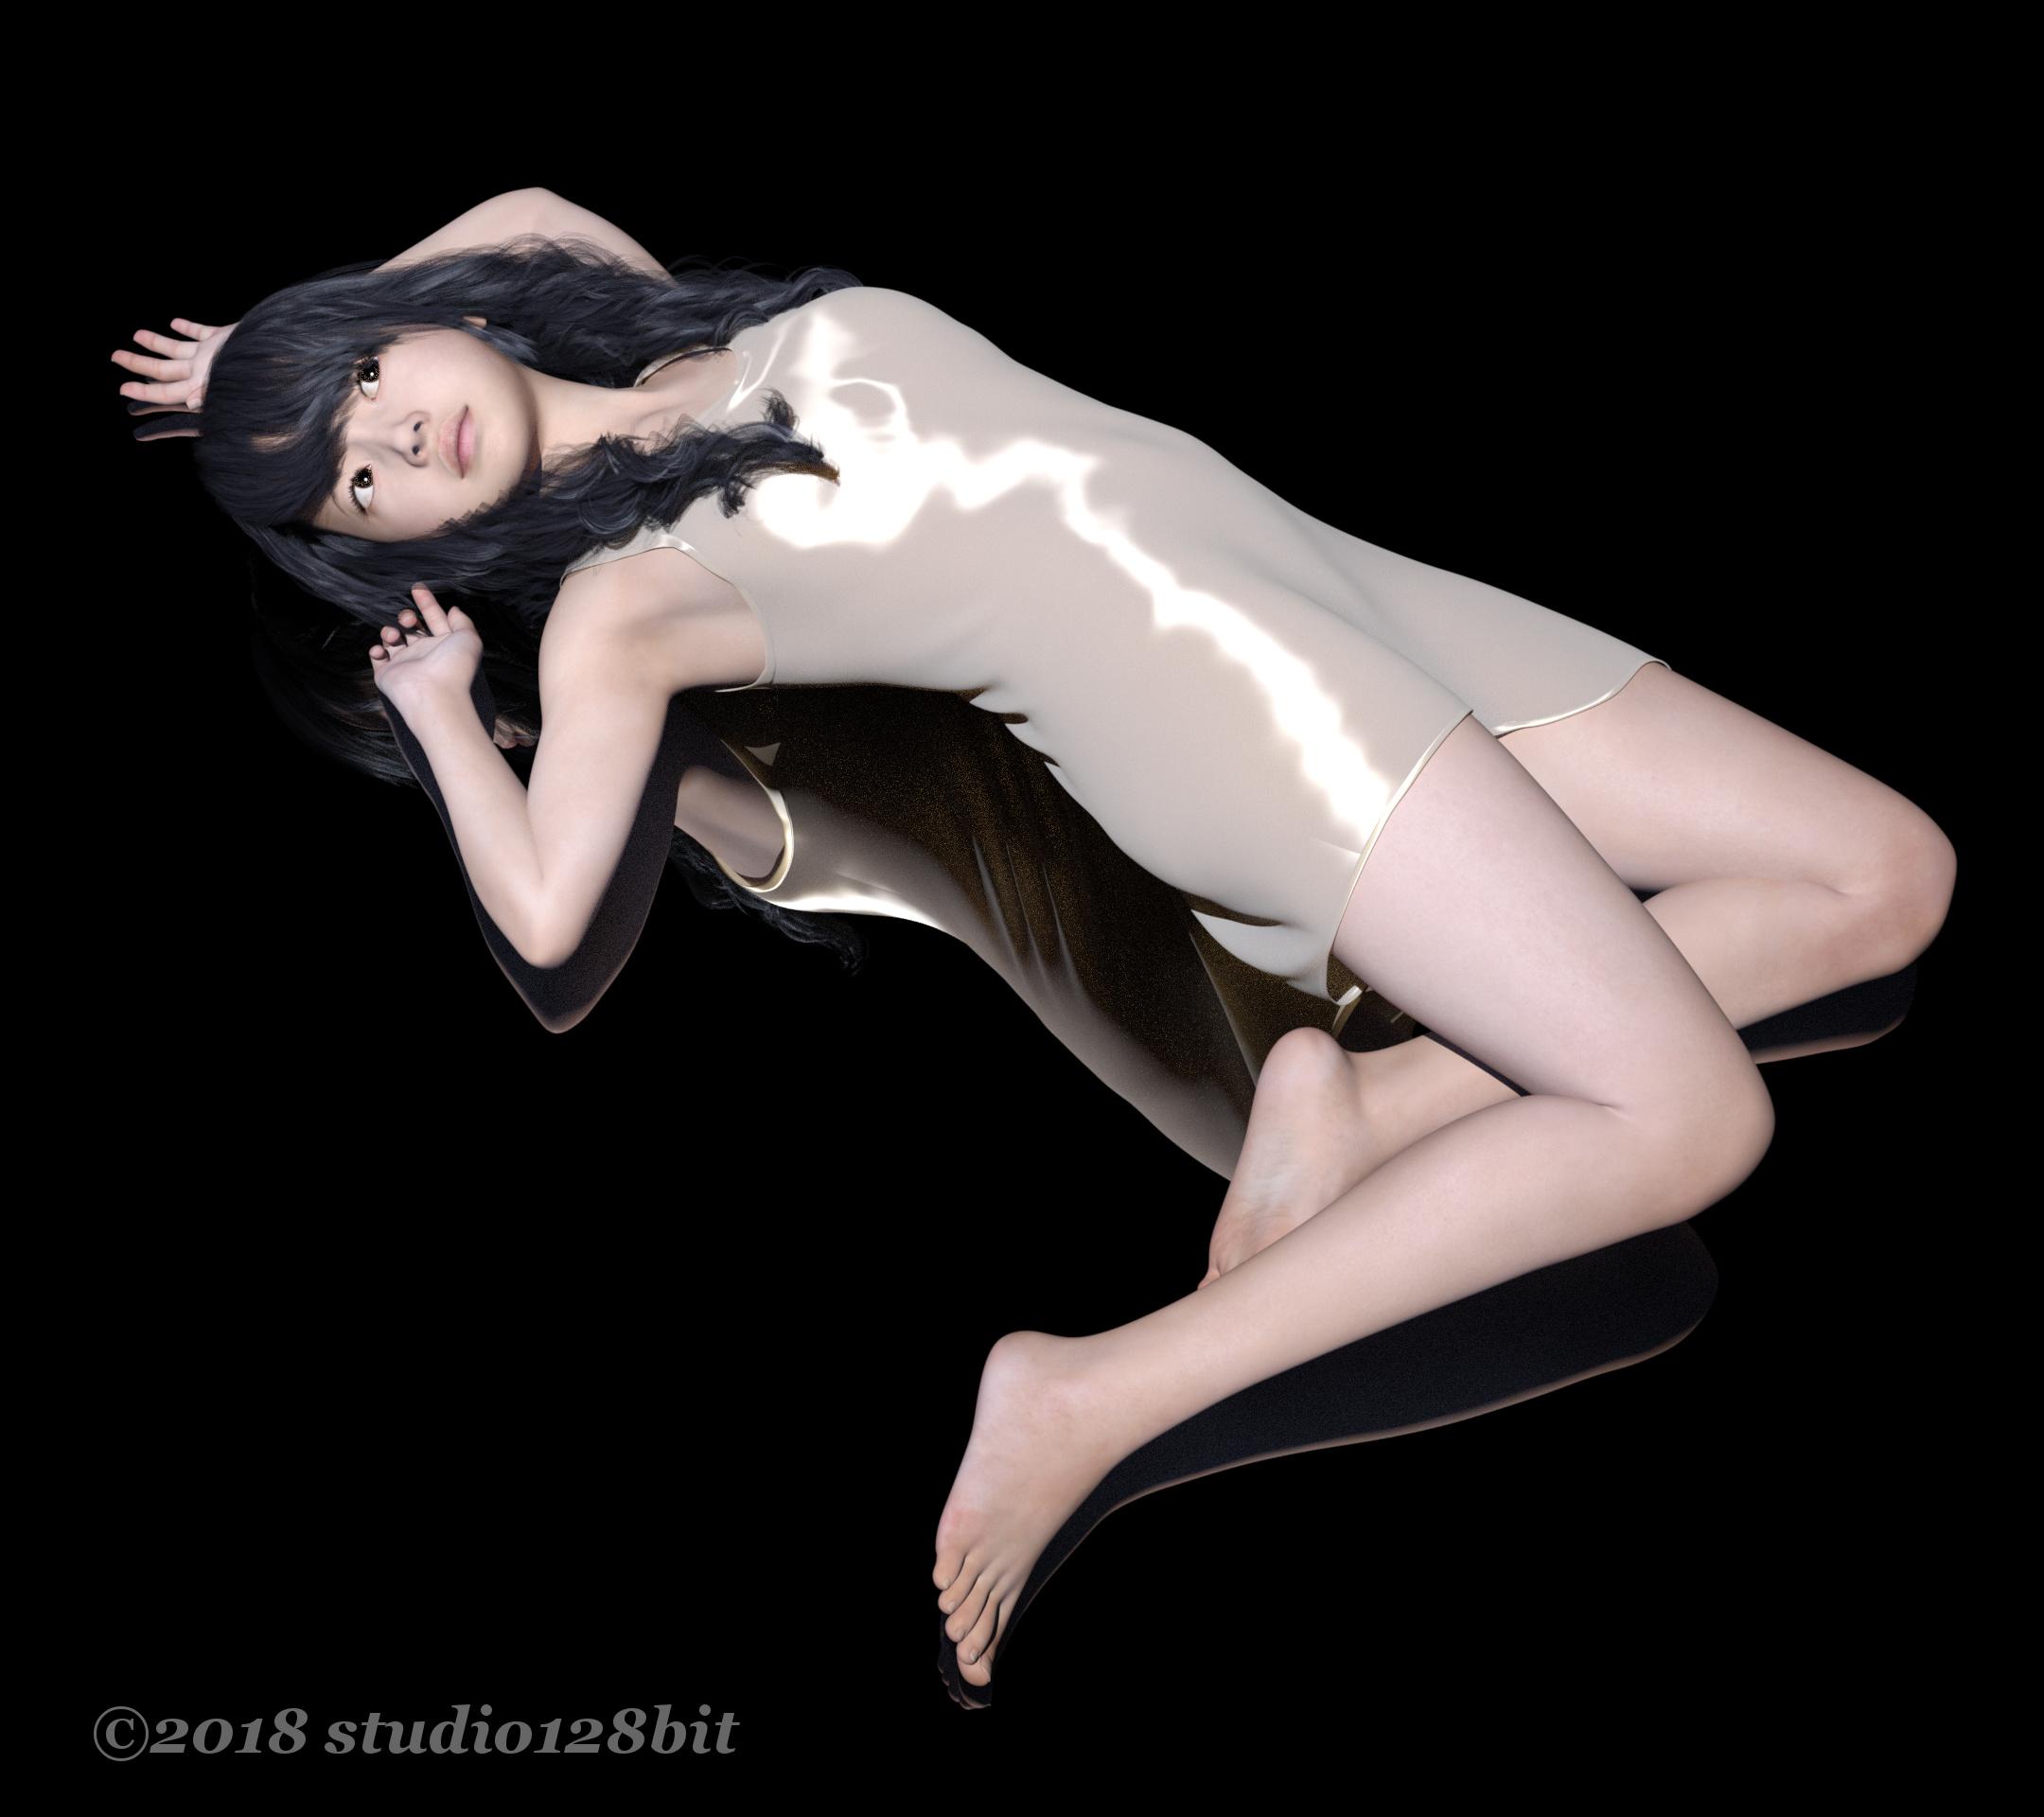 純少女 美少女 Yuka Take13f